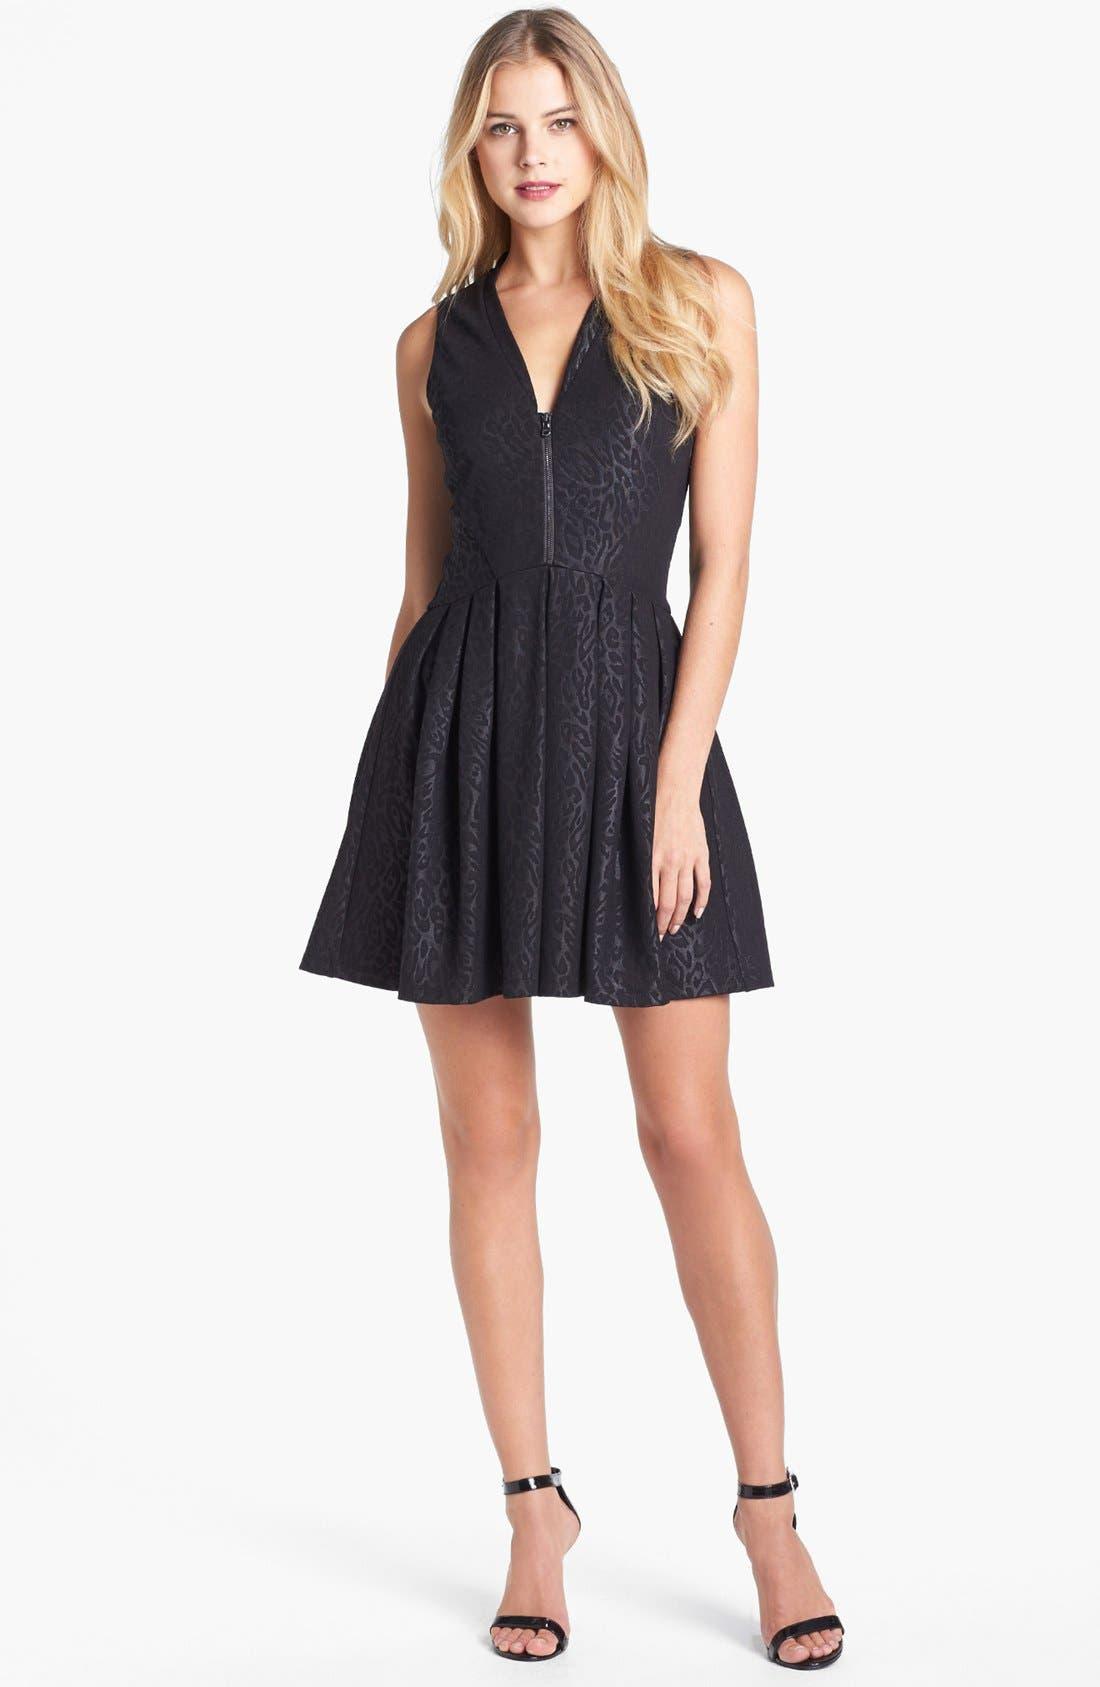 Main Image - GUESS Jacquard Ponte Knit Fit & Flare Dress